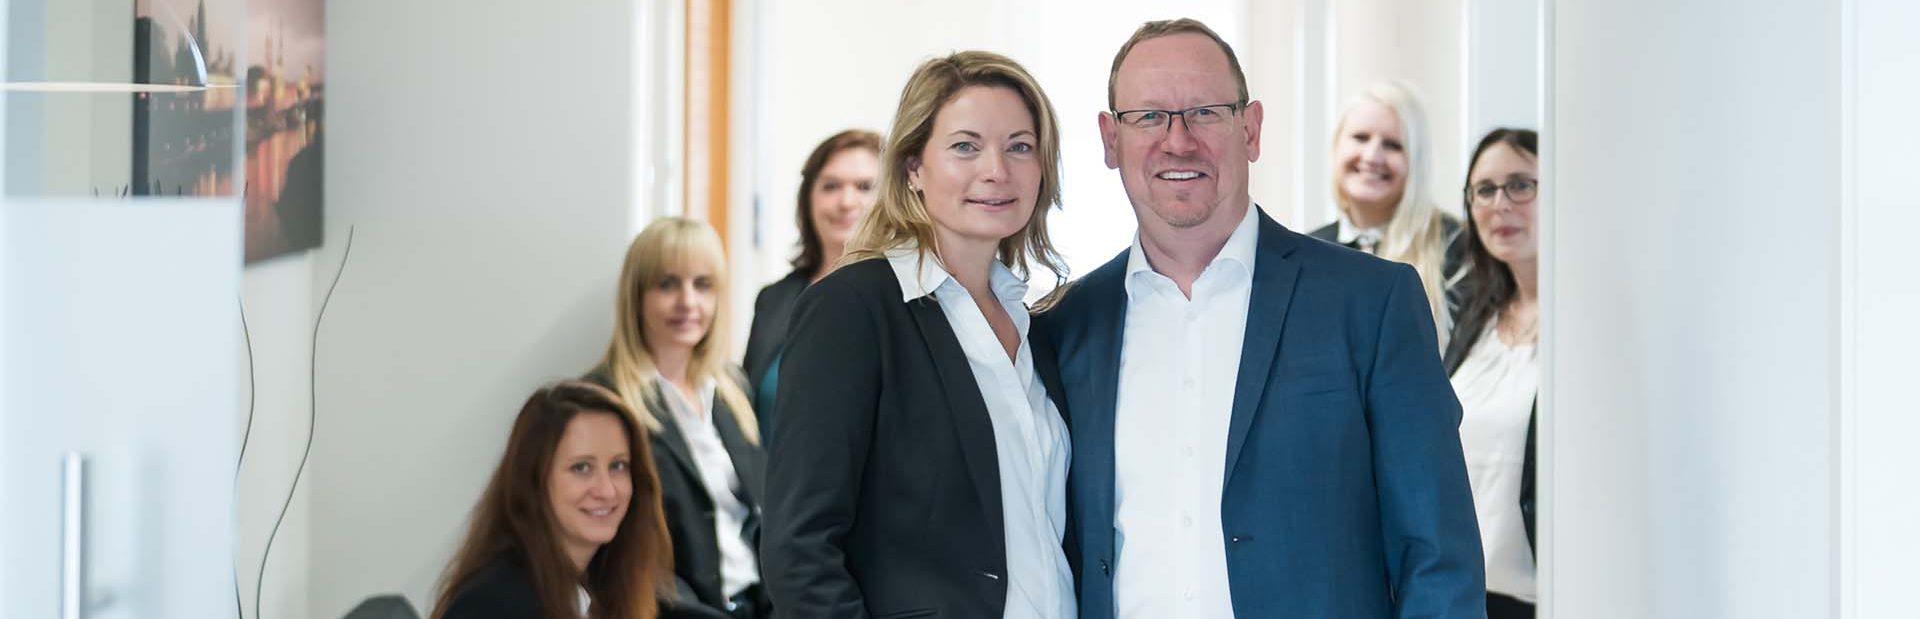 Seeliger & Co. GmbH - Team